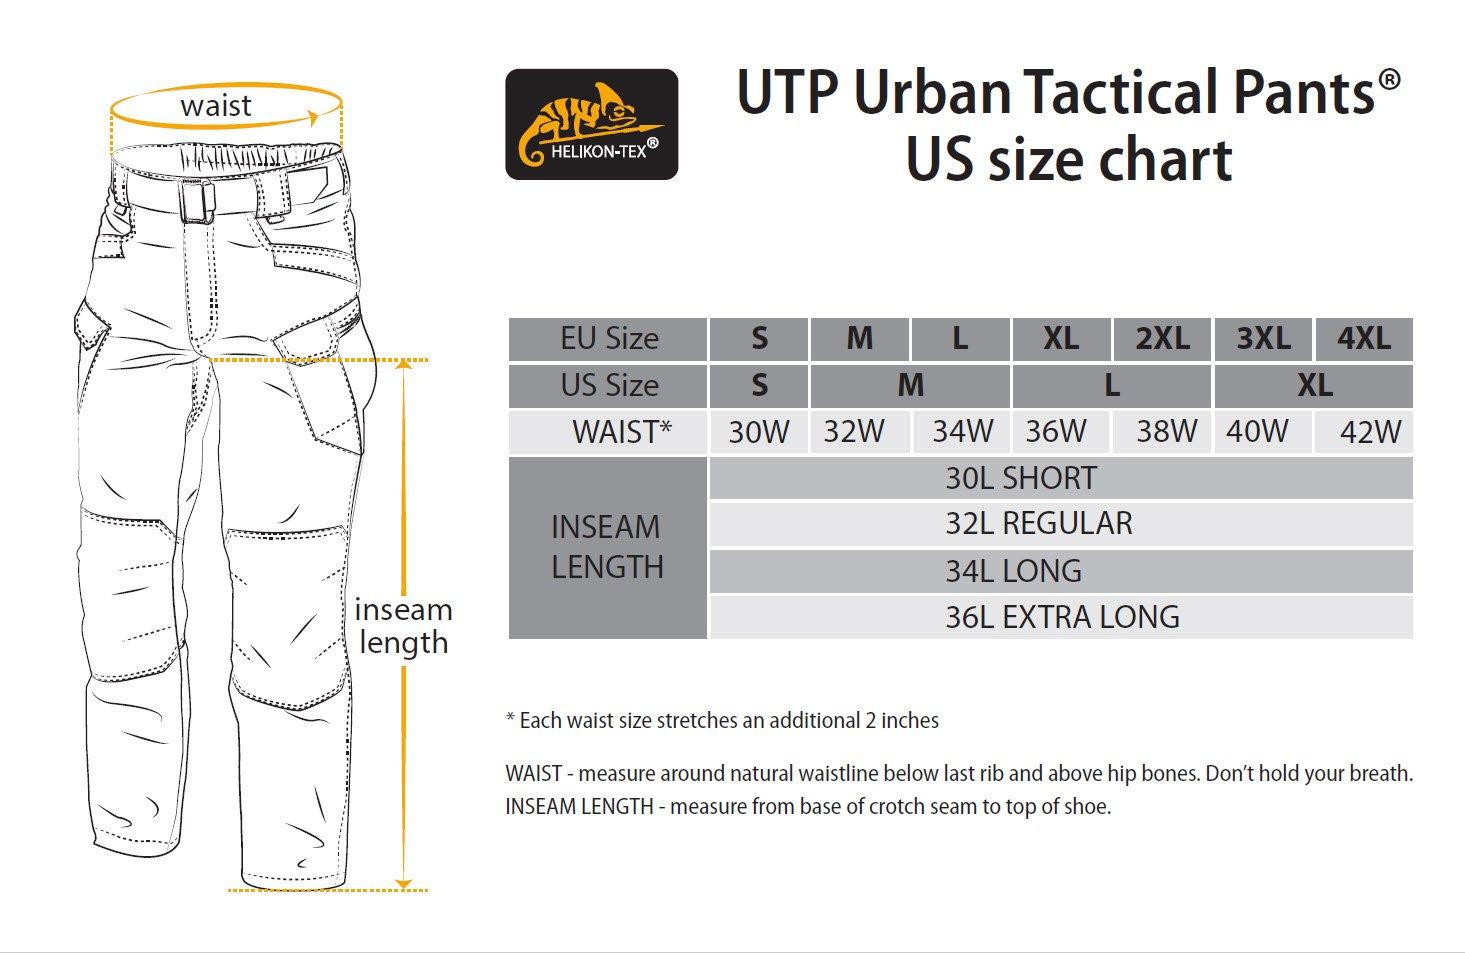 HELIKON-TEX Urban Line, UTP Urban Tactical Pants Ripstop Khaki, Military Ripstop Cargo Style, Men's Waist 38 Length 32 by HELIKON-TEX (Image #7)